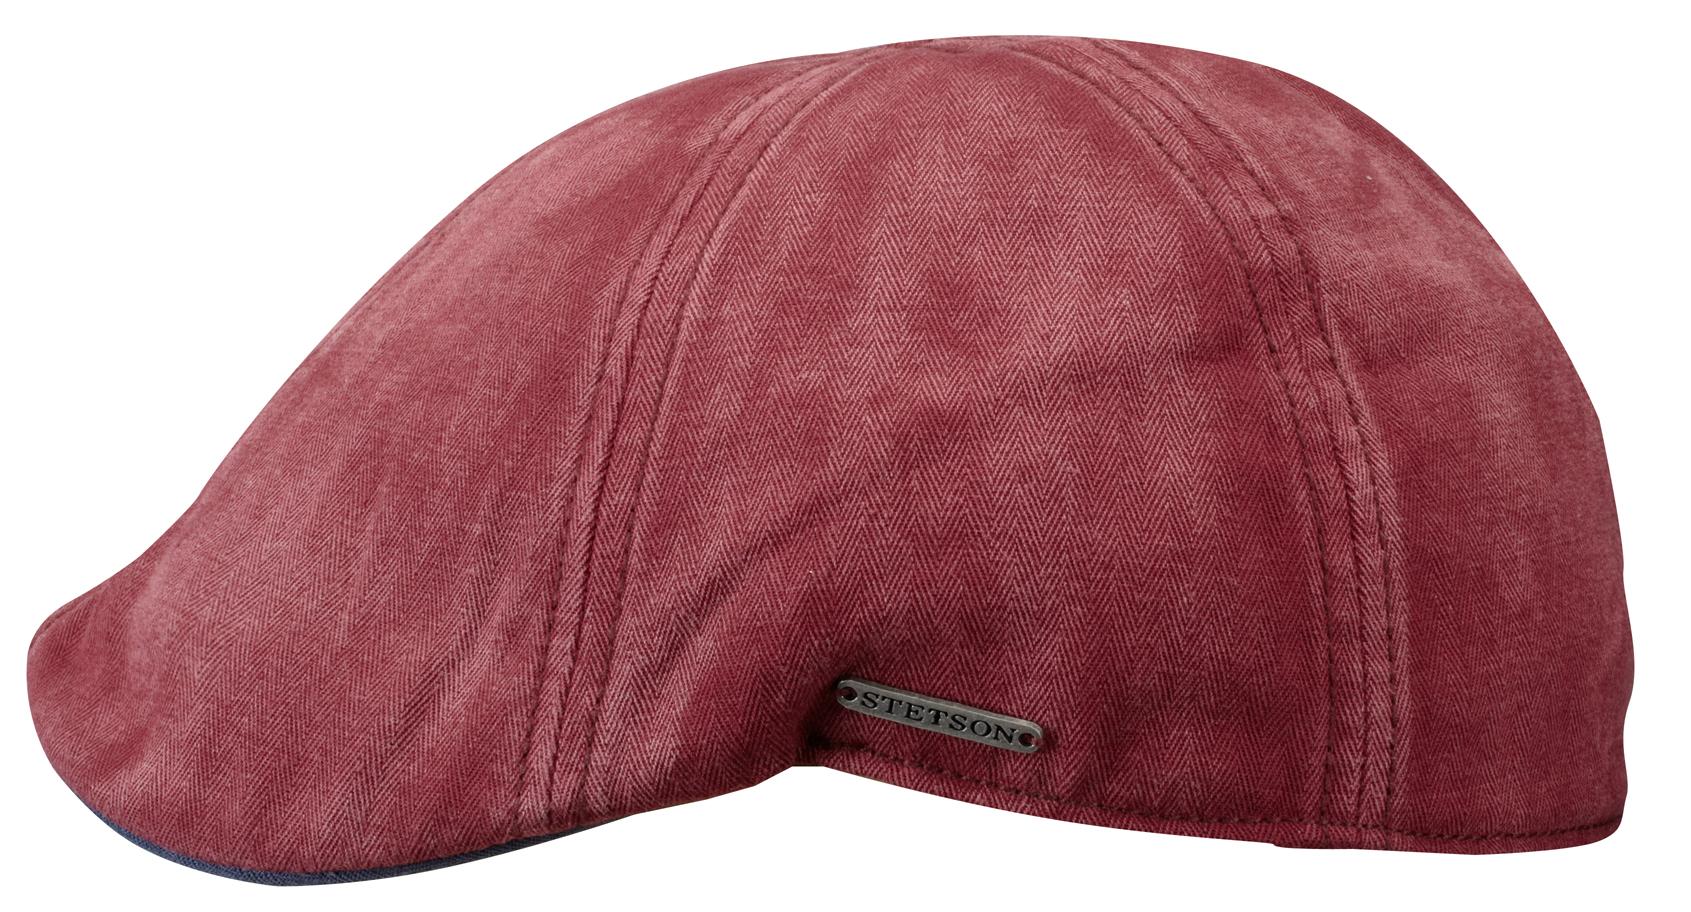 Casquette plate Texas Cotton Stetson rouge - Kausia f29bdcc6f9a